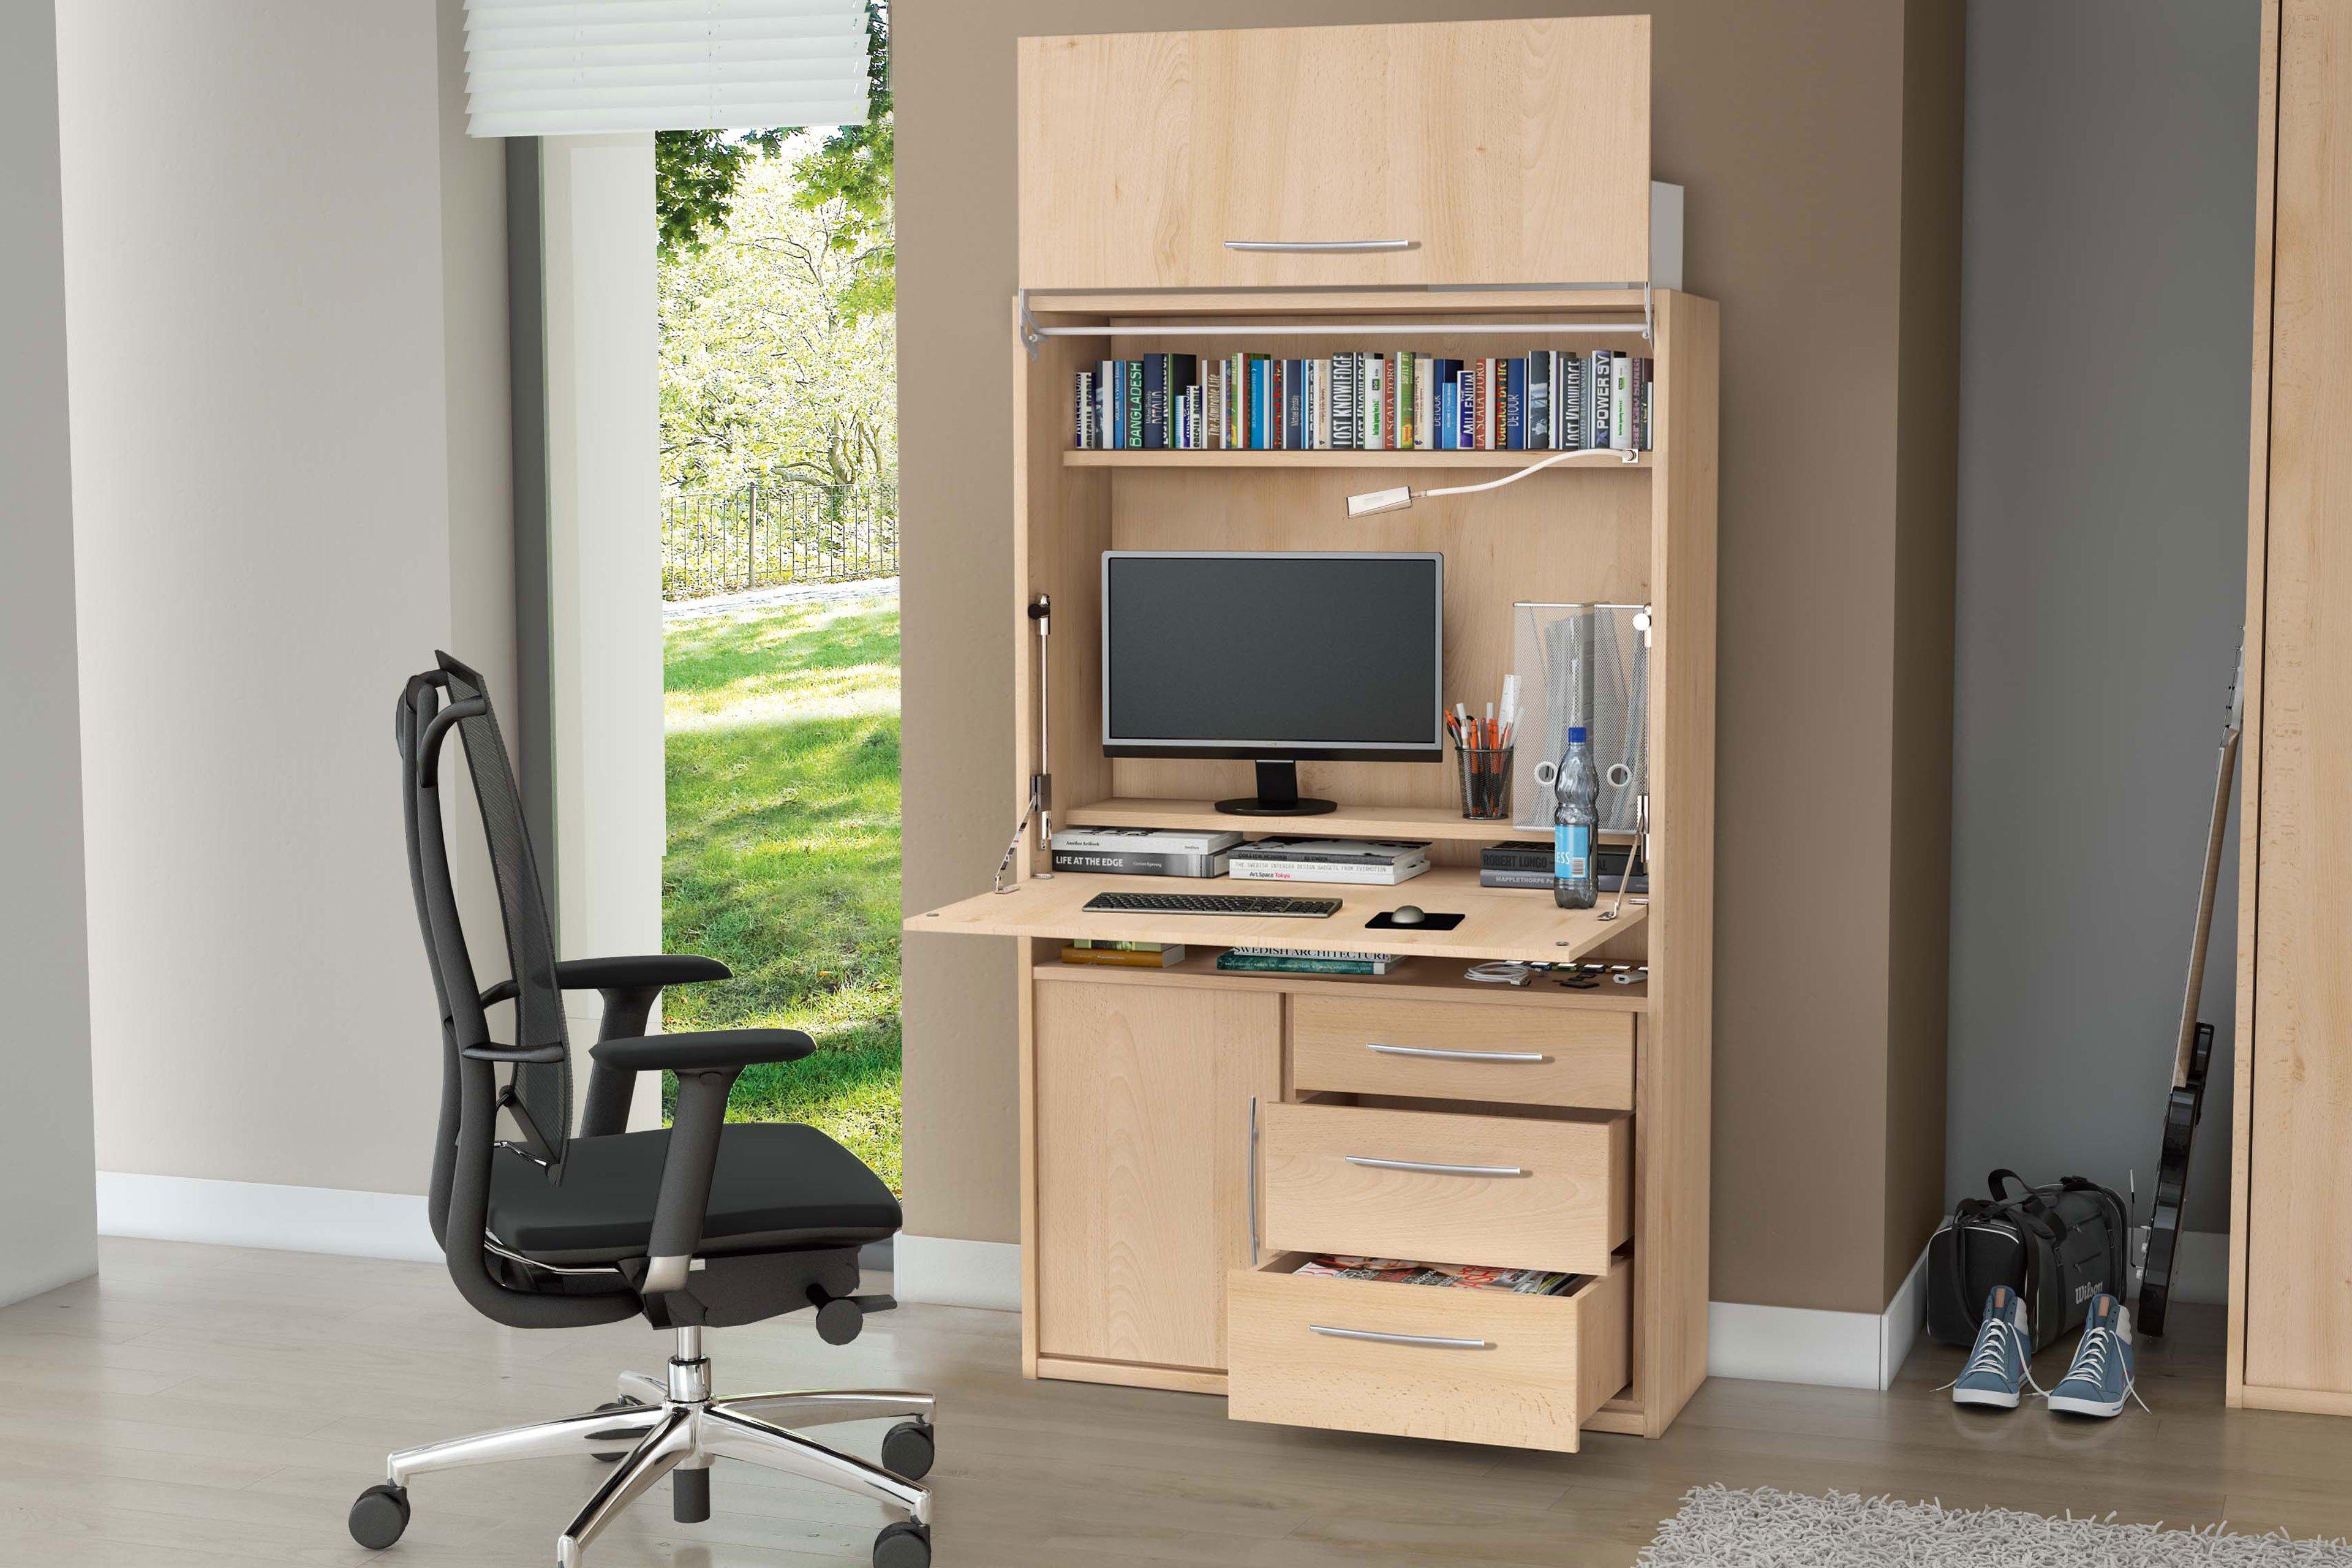 priess sekret r home office mit schwenkliftt r m bel letz ihr online shop. Black Bedroom Furniture Sets. Home Design Ideas